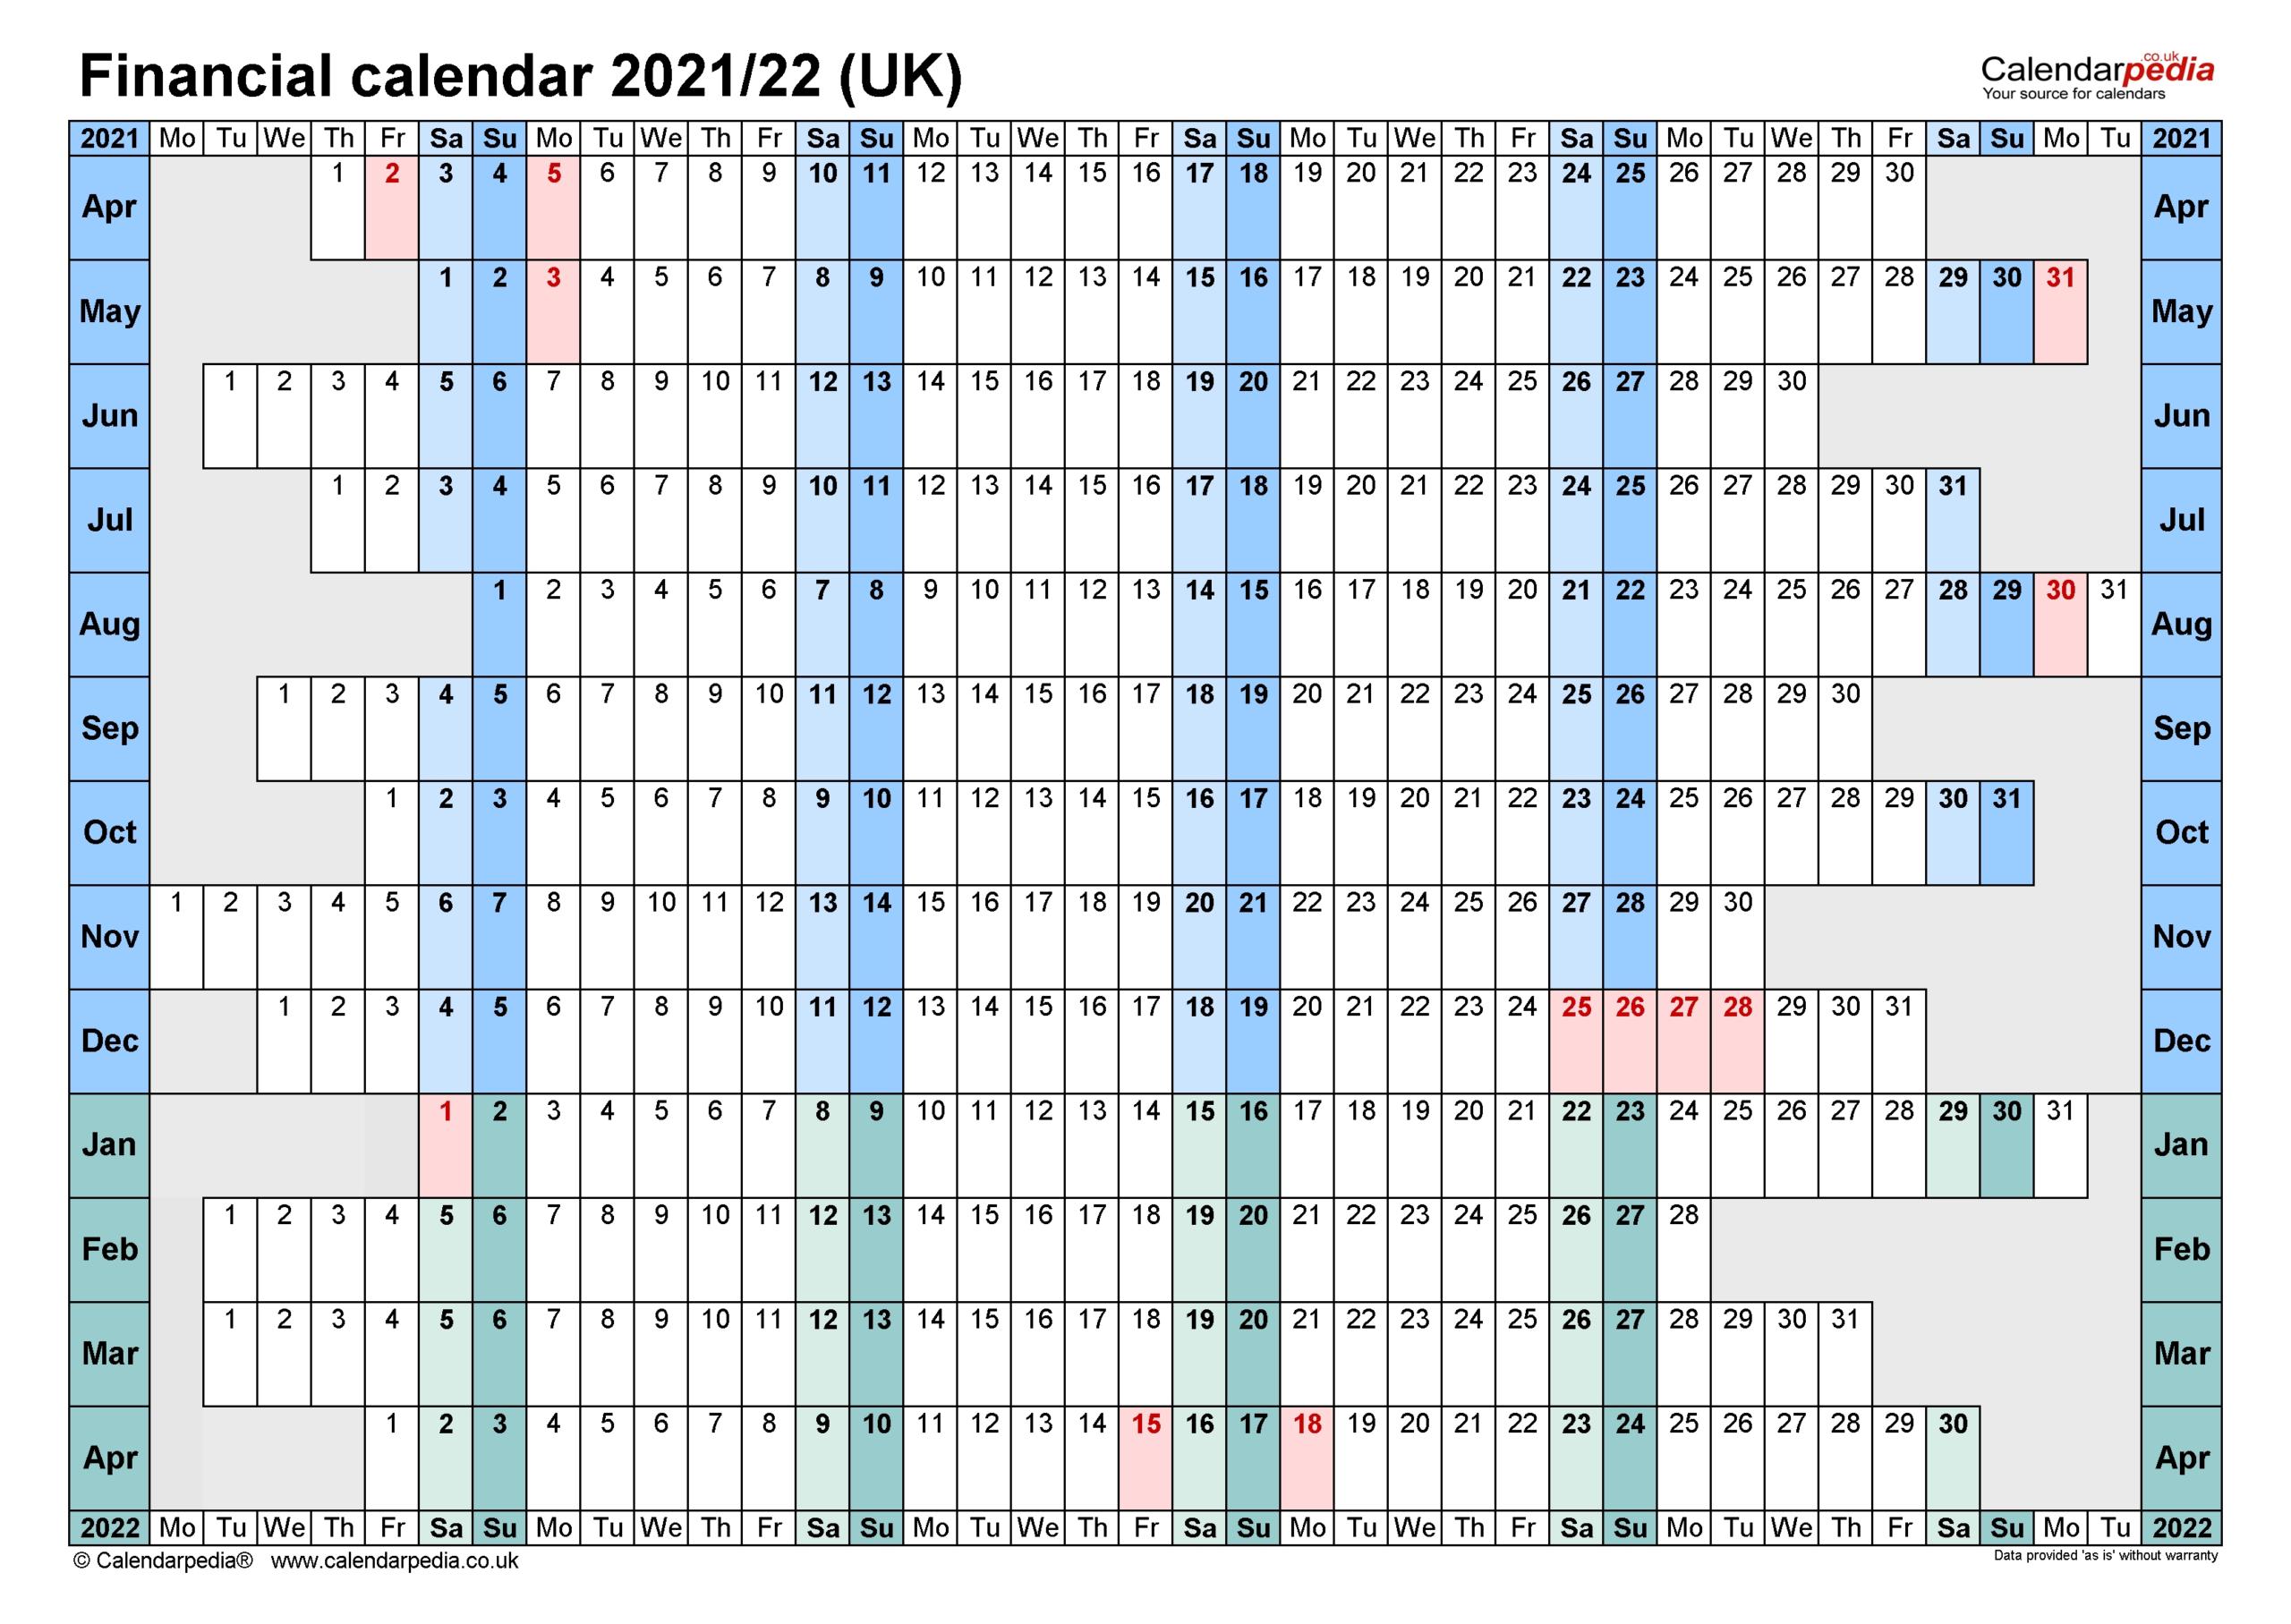 Edi Suparman - Page 4 - Template Calendar Design  2021 2021 Financial Year Calendar Australia